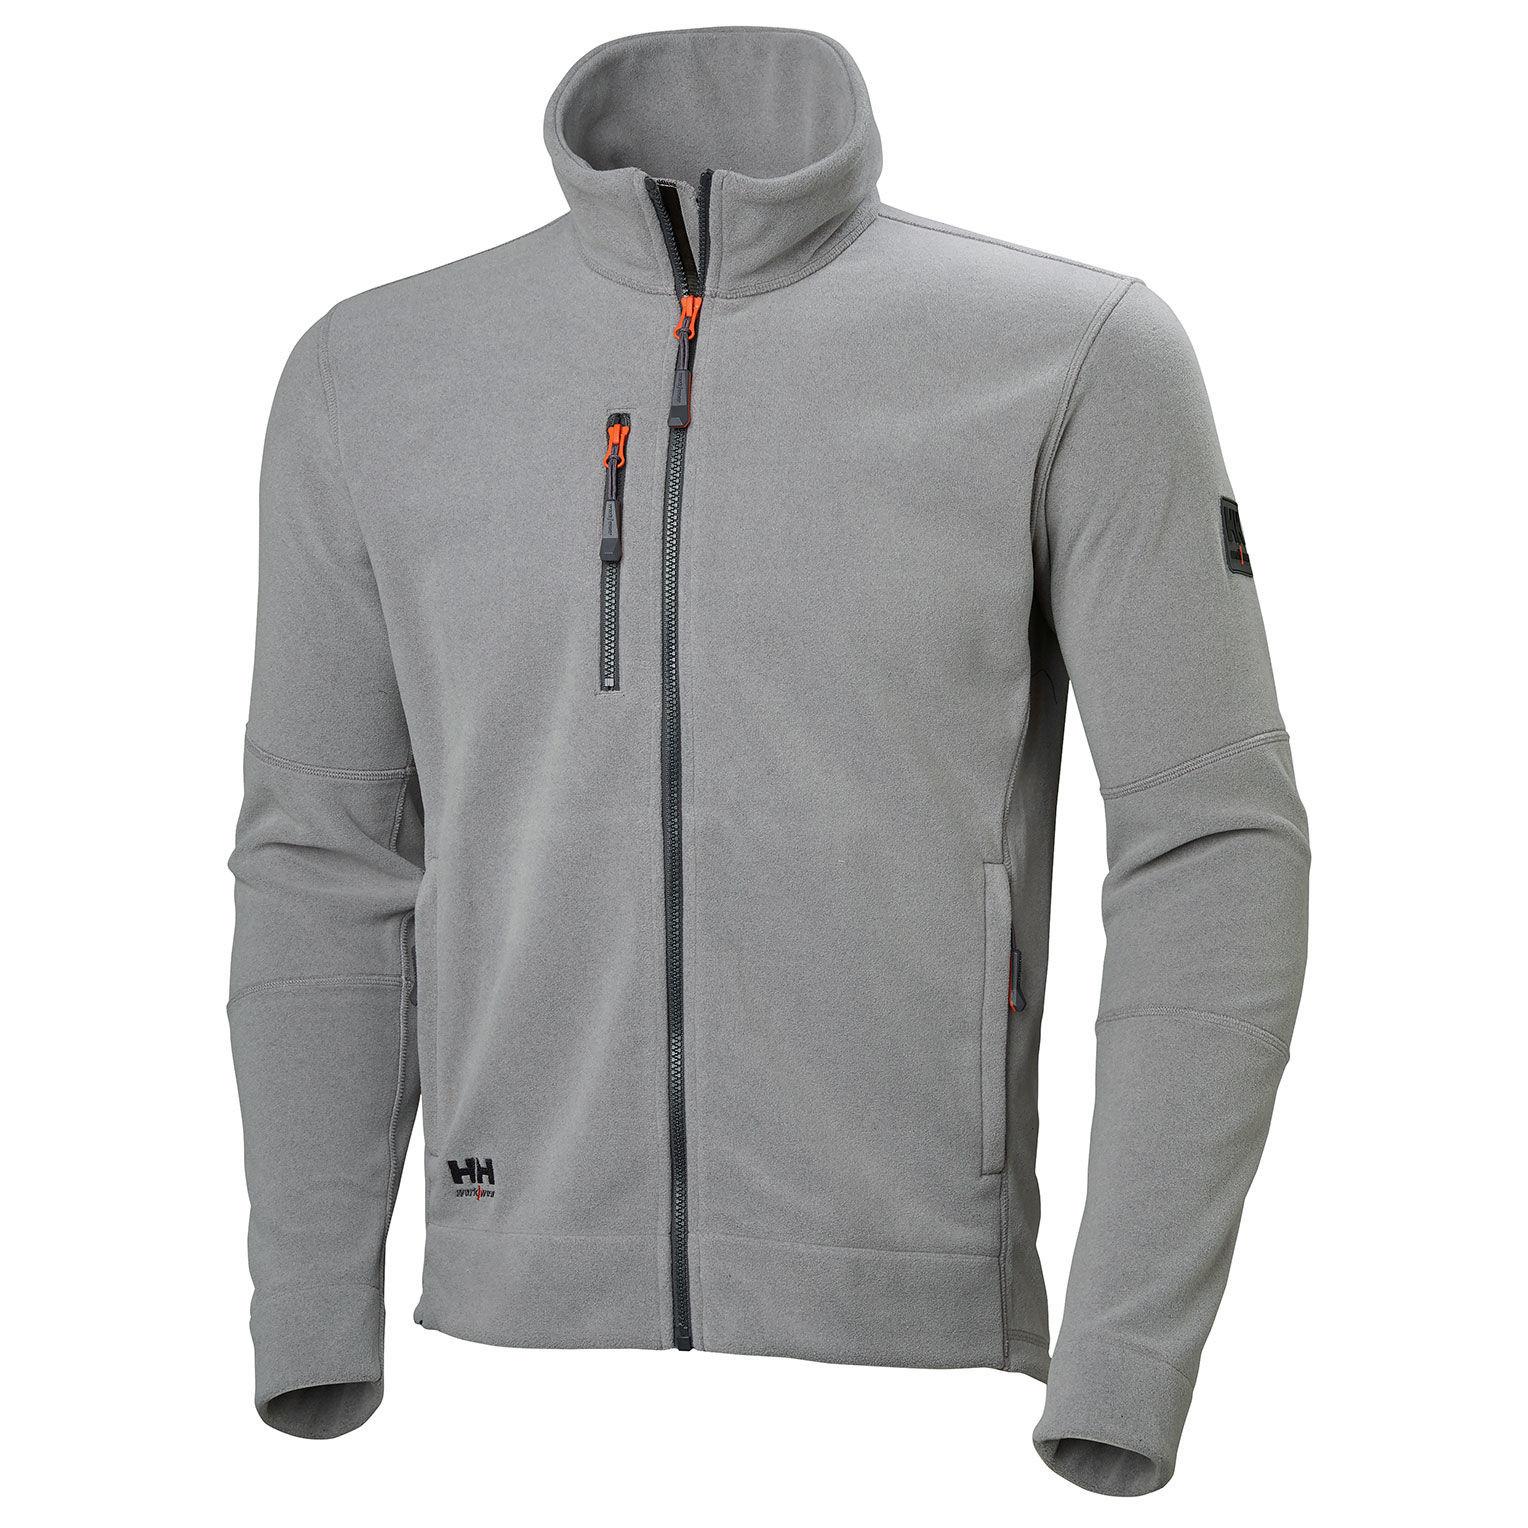 Кофта Helly Hansen Kensington Fleece Jacket - 72158 (Grey Melange)